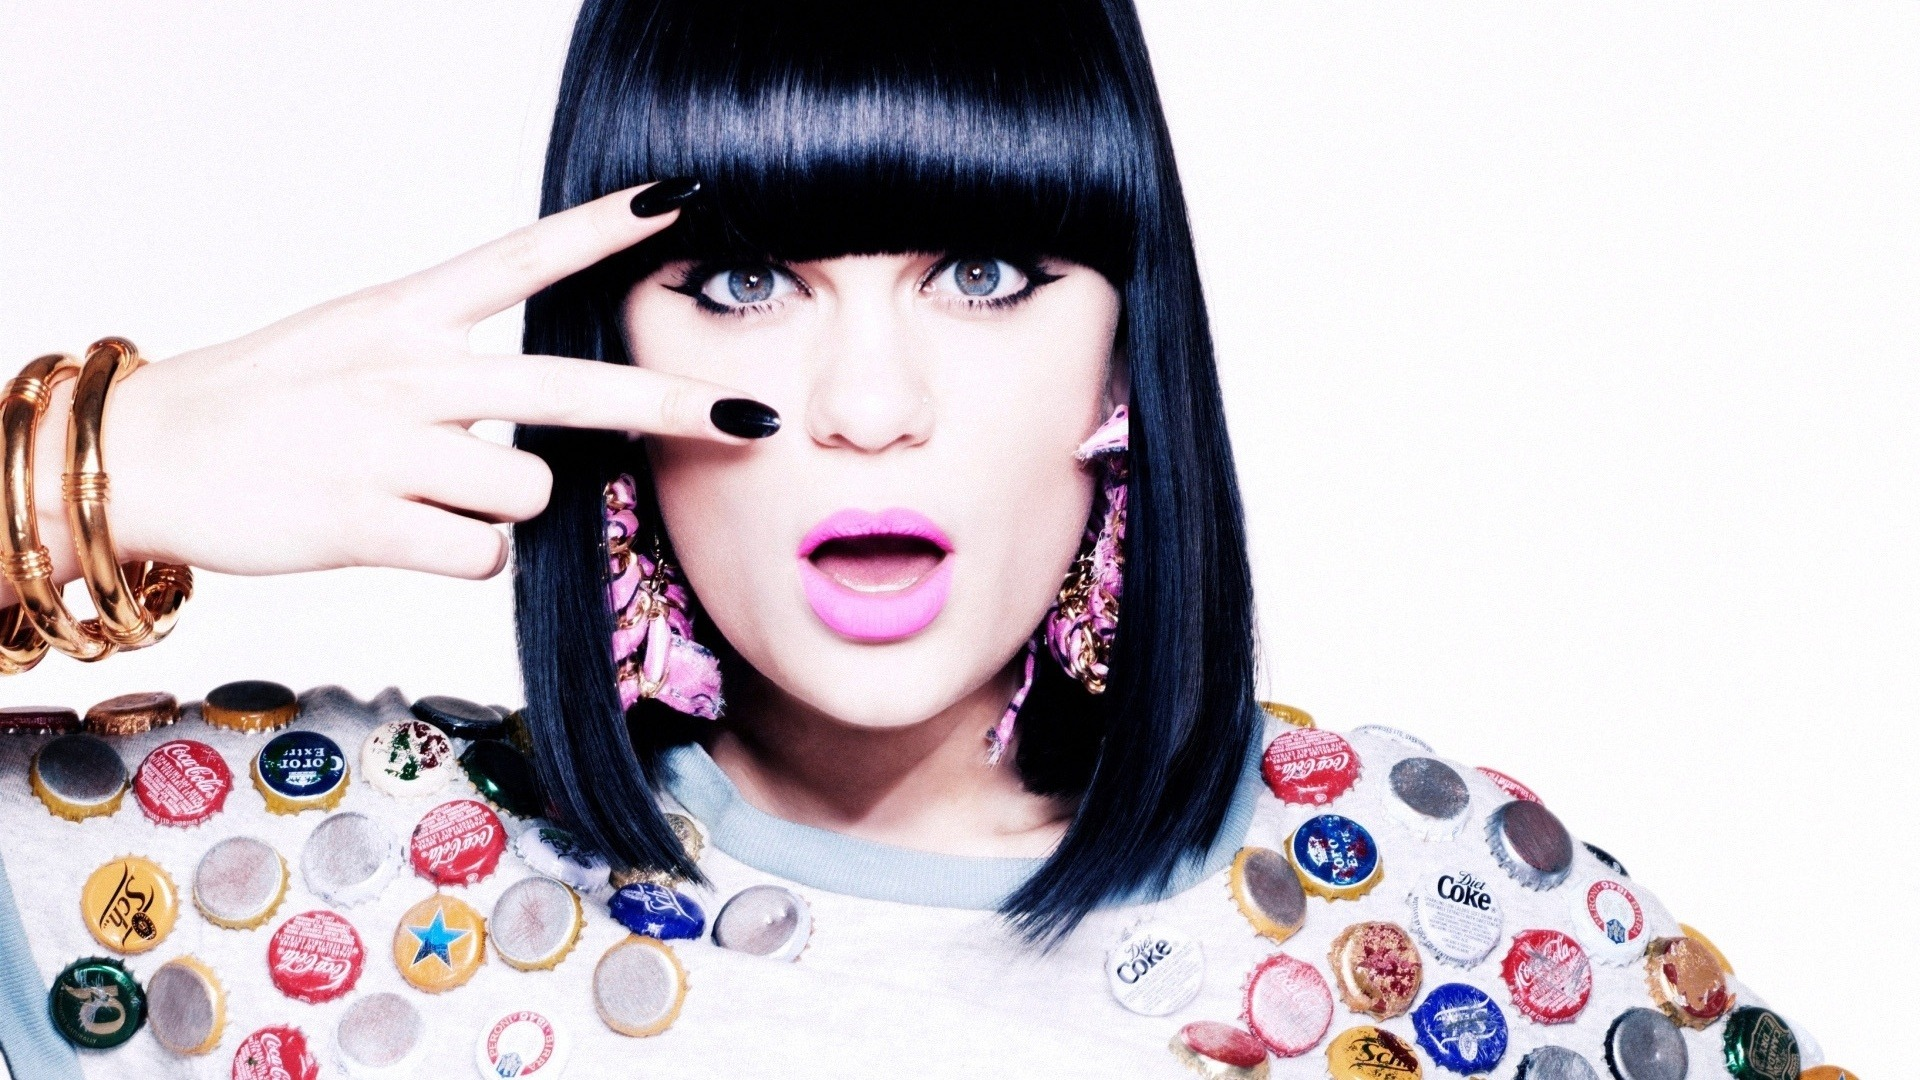 Square One av Jessie J